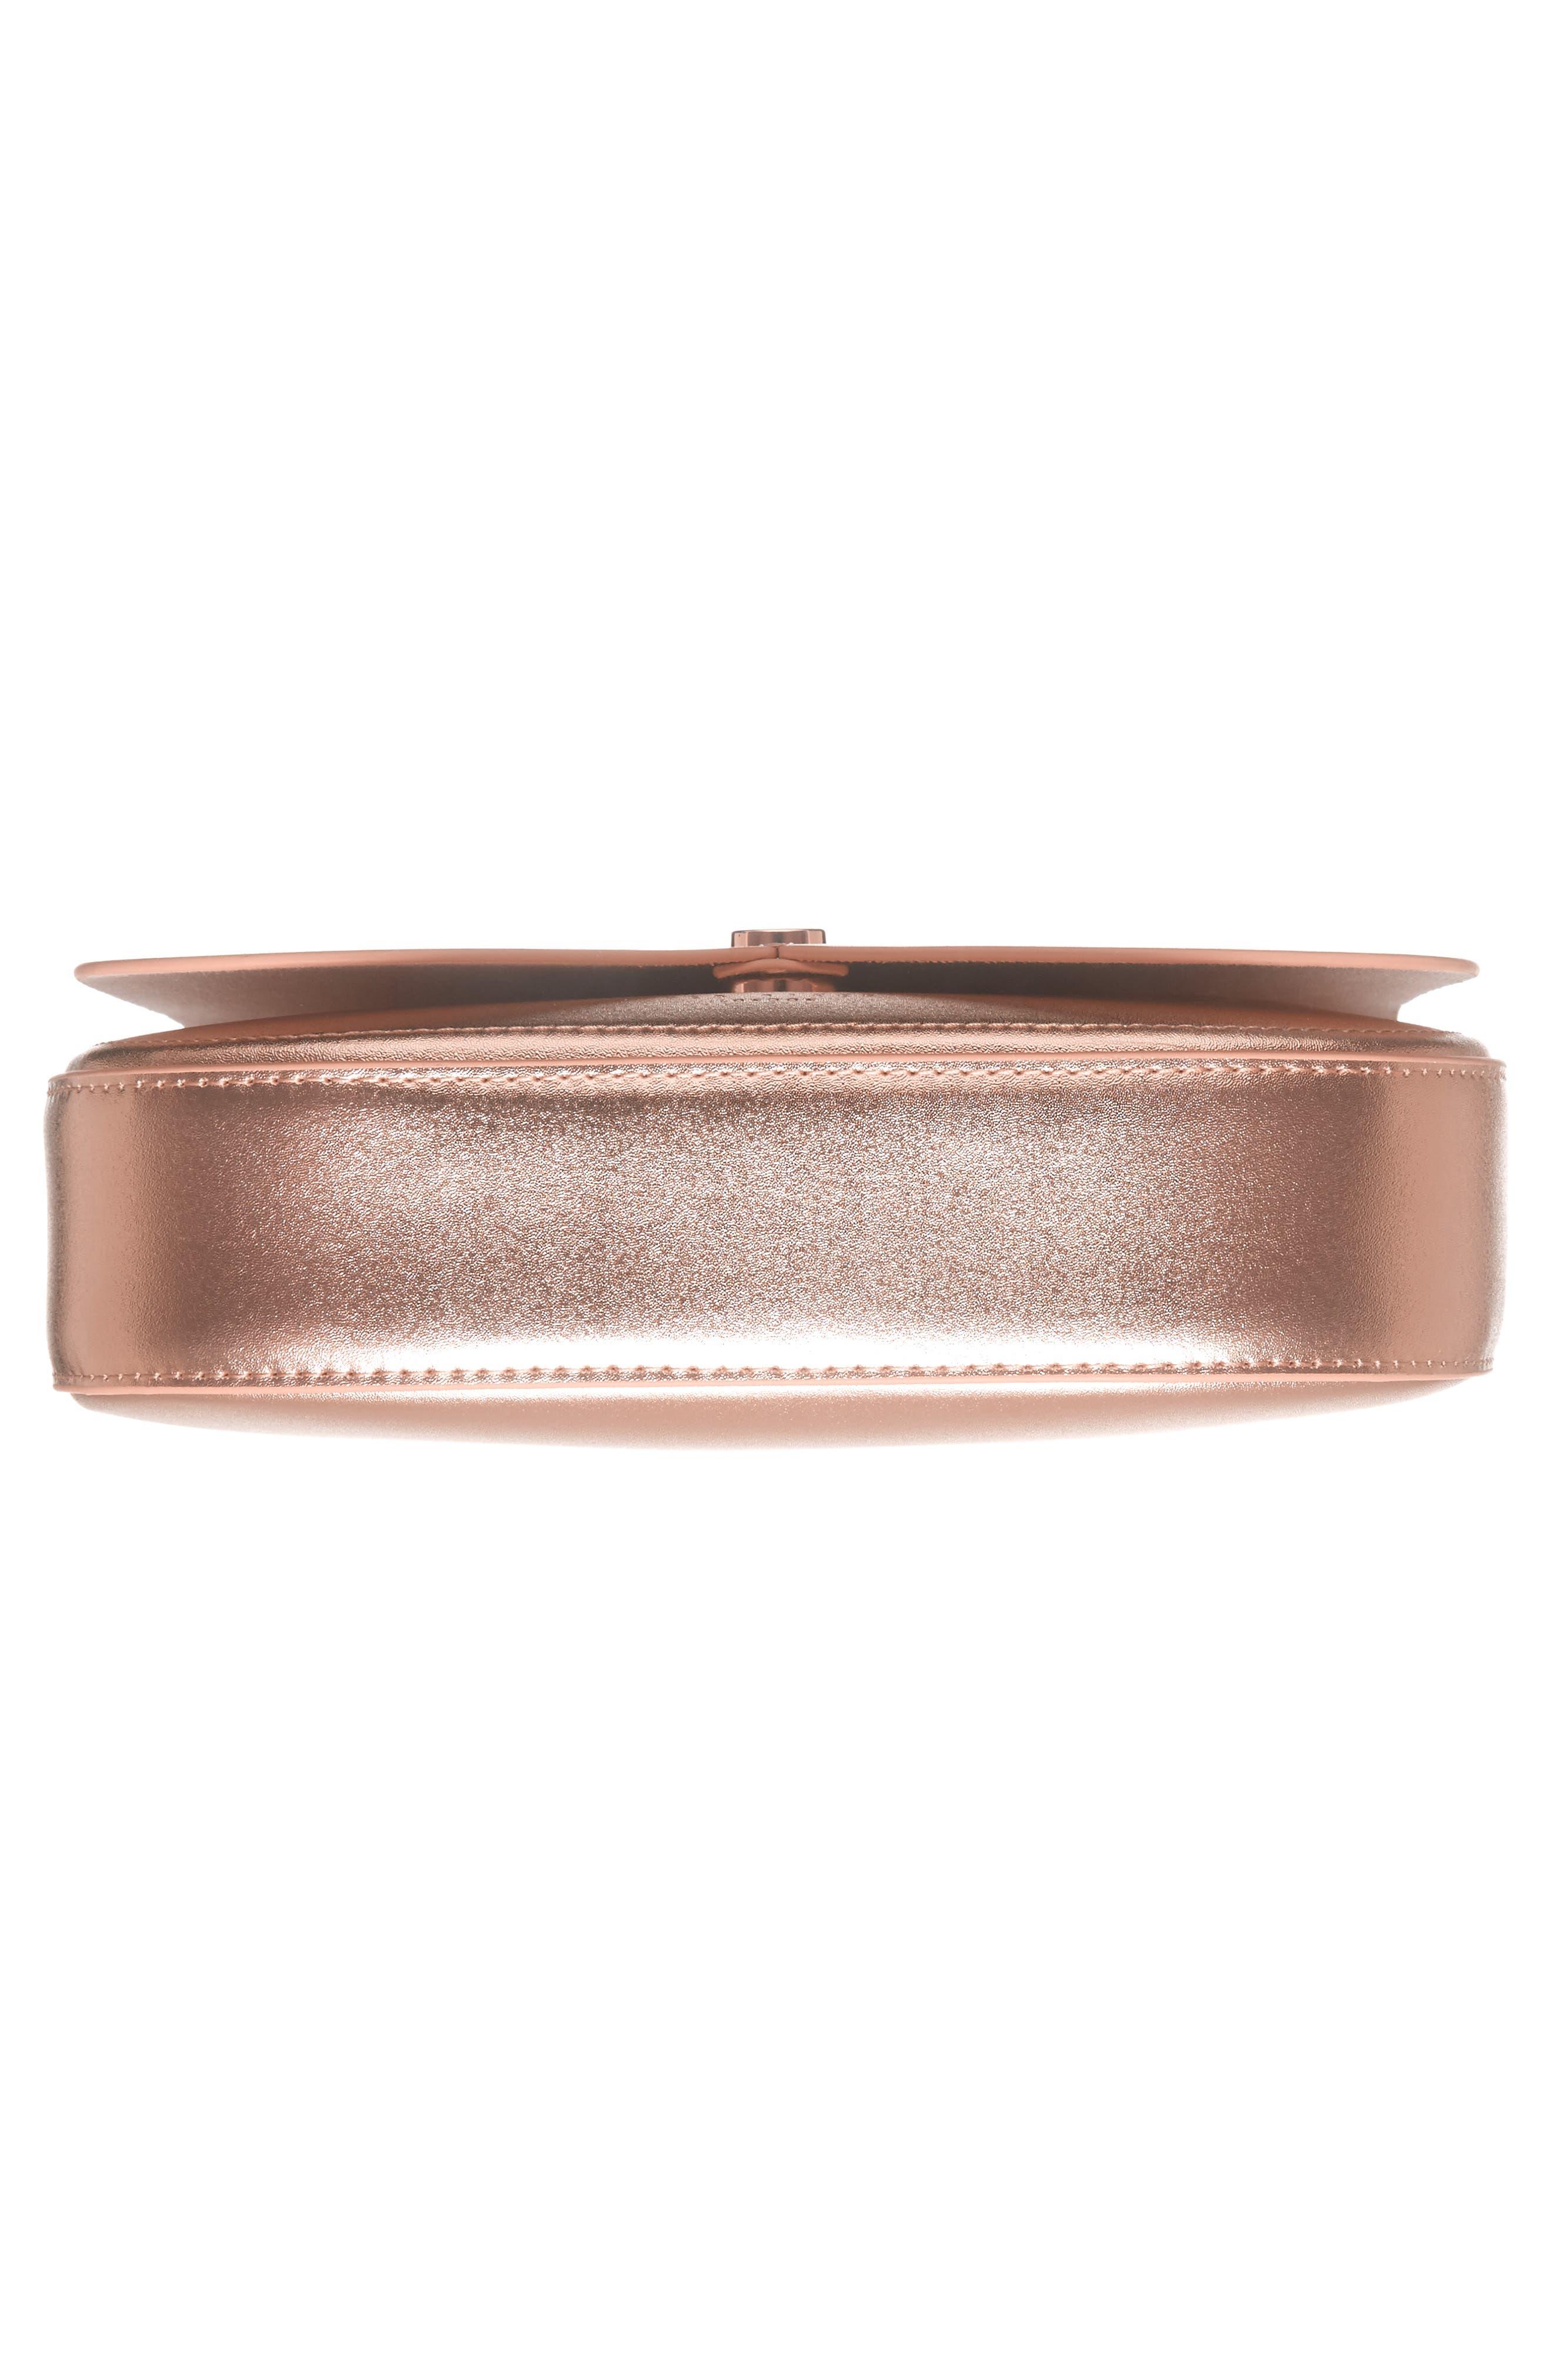 Kittii Cat Leather Crossbody Bag,                             Alternate thumbnail 5, color,                             Rose Gold